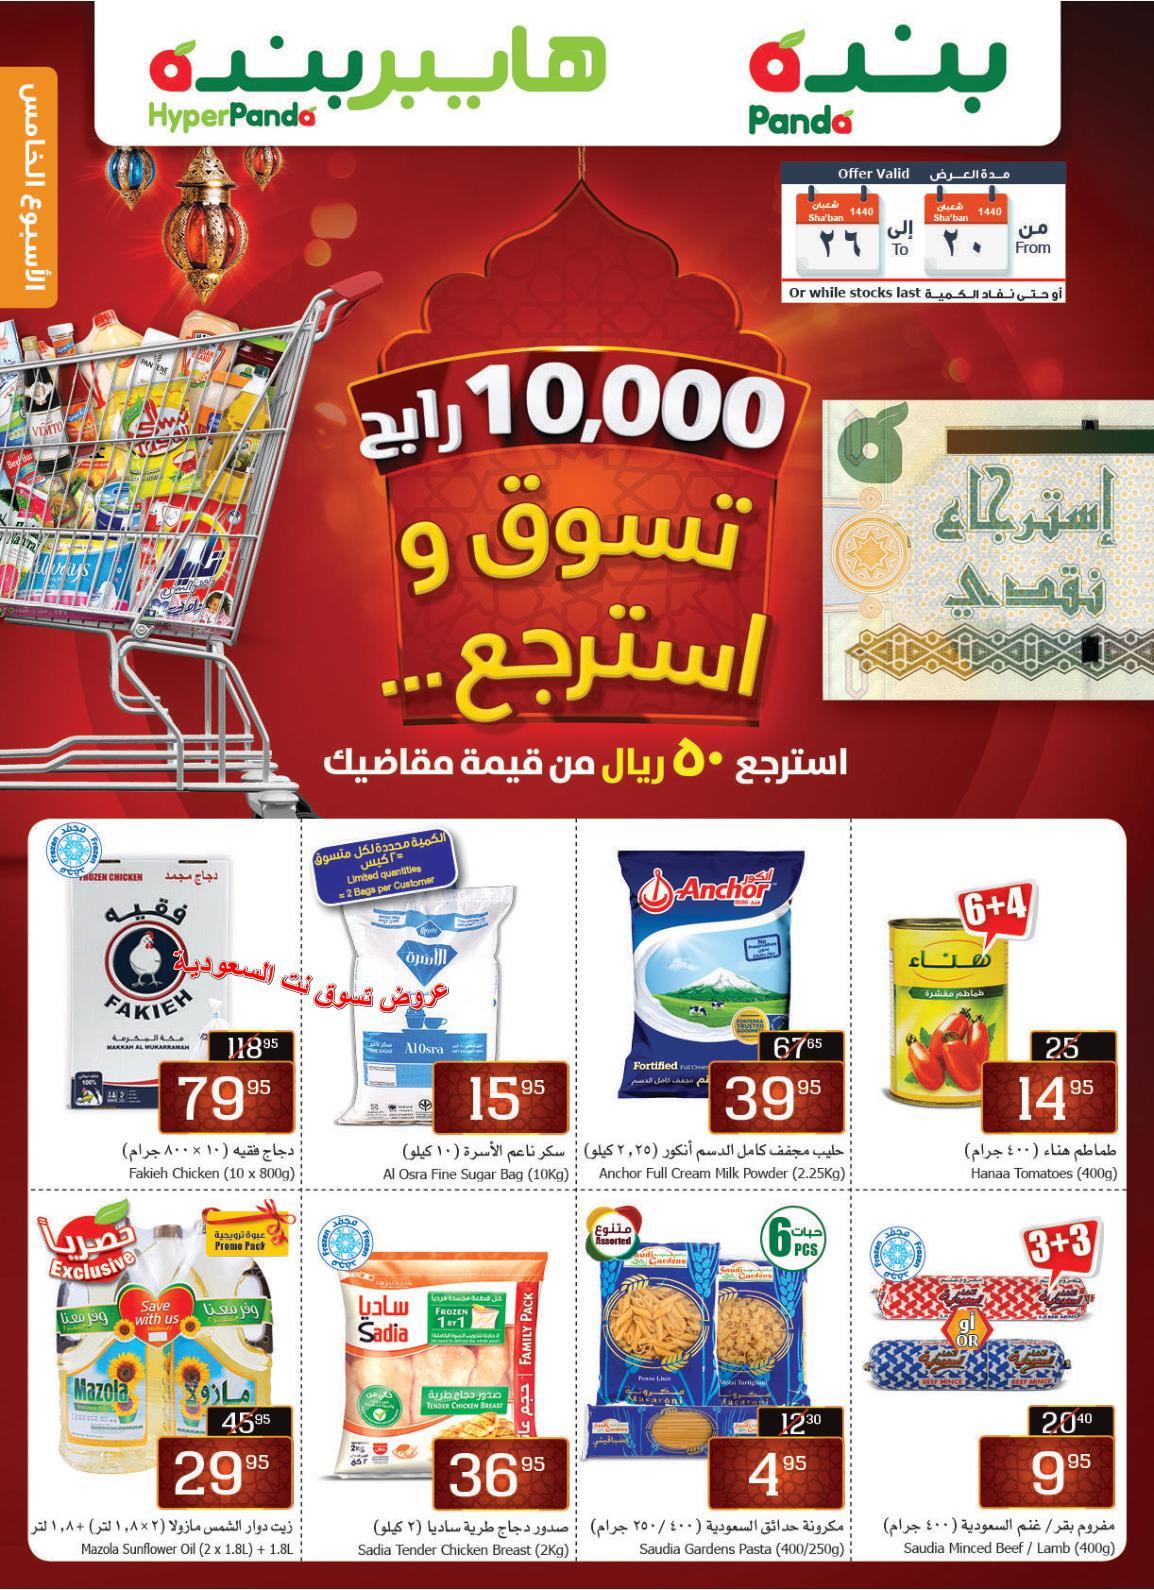 0c62a3fb3 عروض بنده وهايبر بنده السعودية الرياض حتى 1-5-2019 رمضان هل | تسوق نت